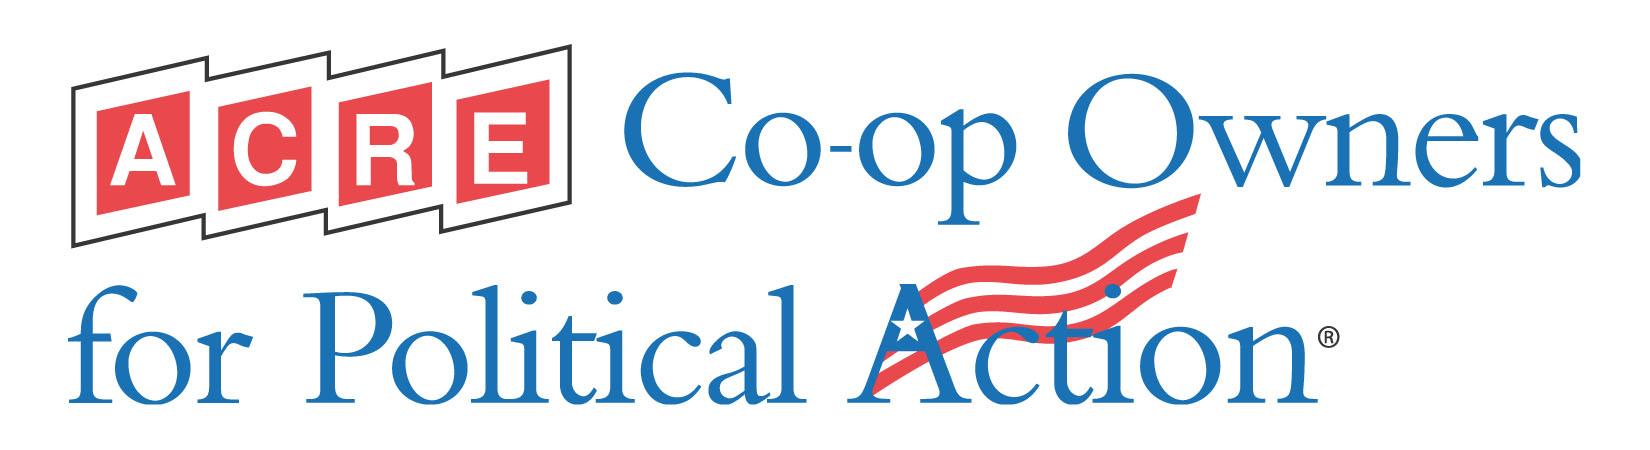 CoopOwnersForPolitcalActionLogo